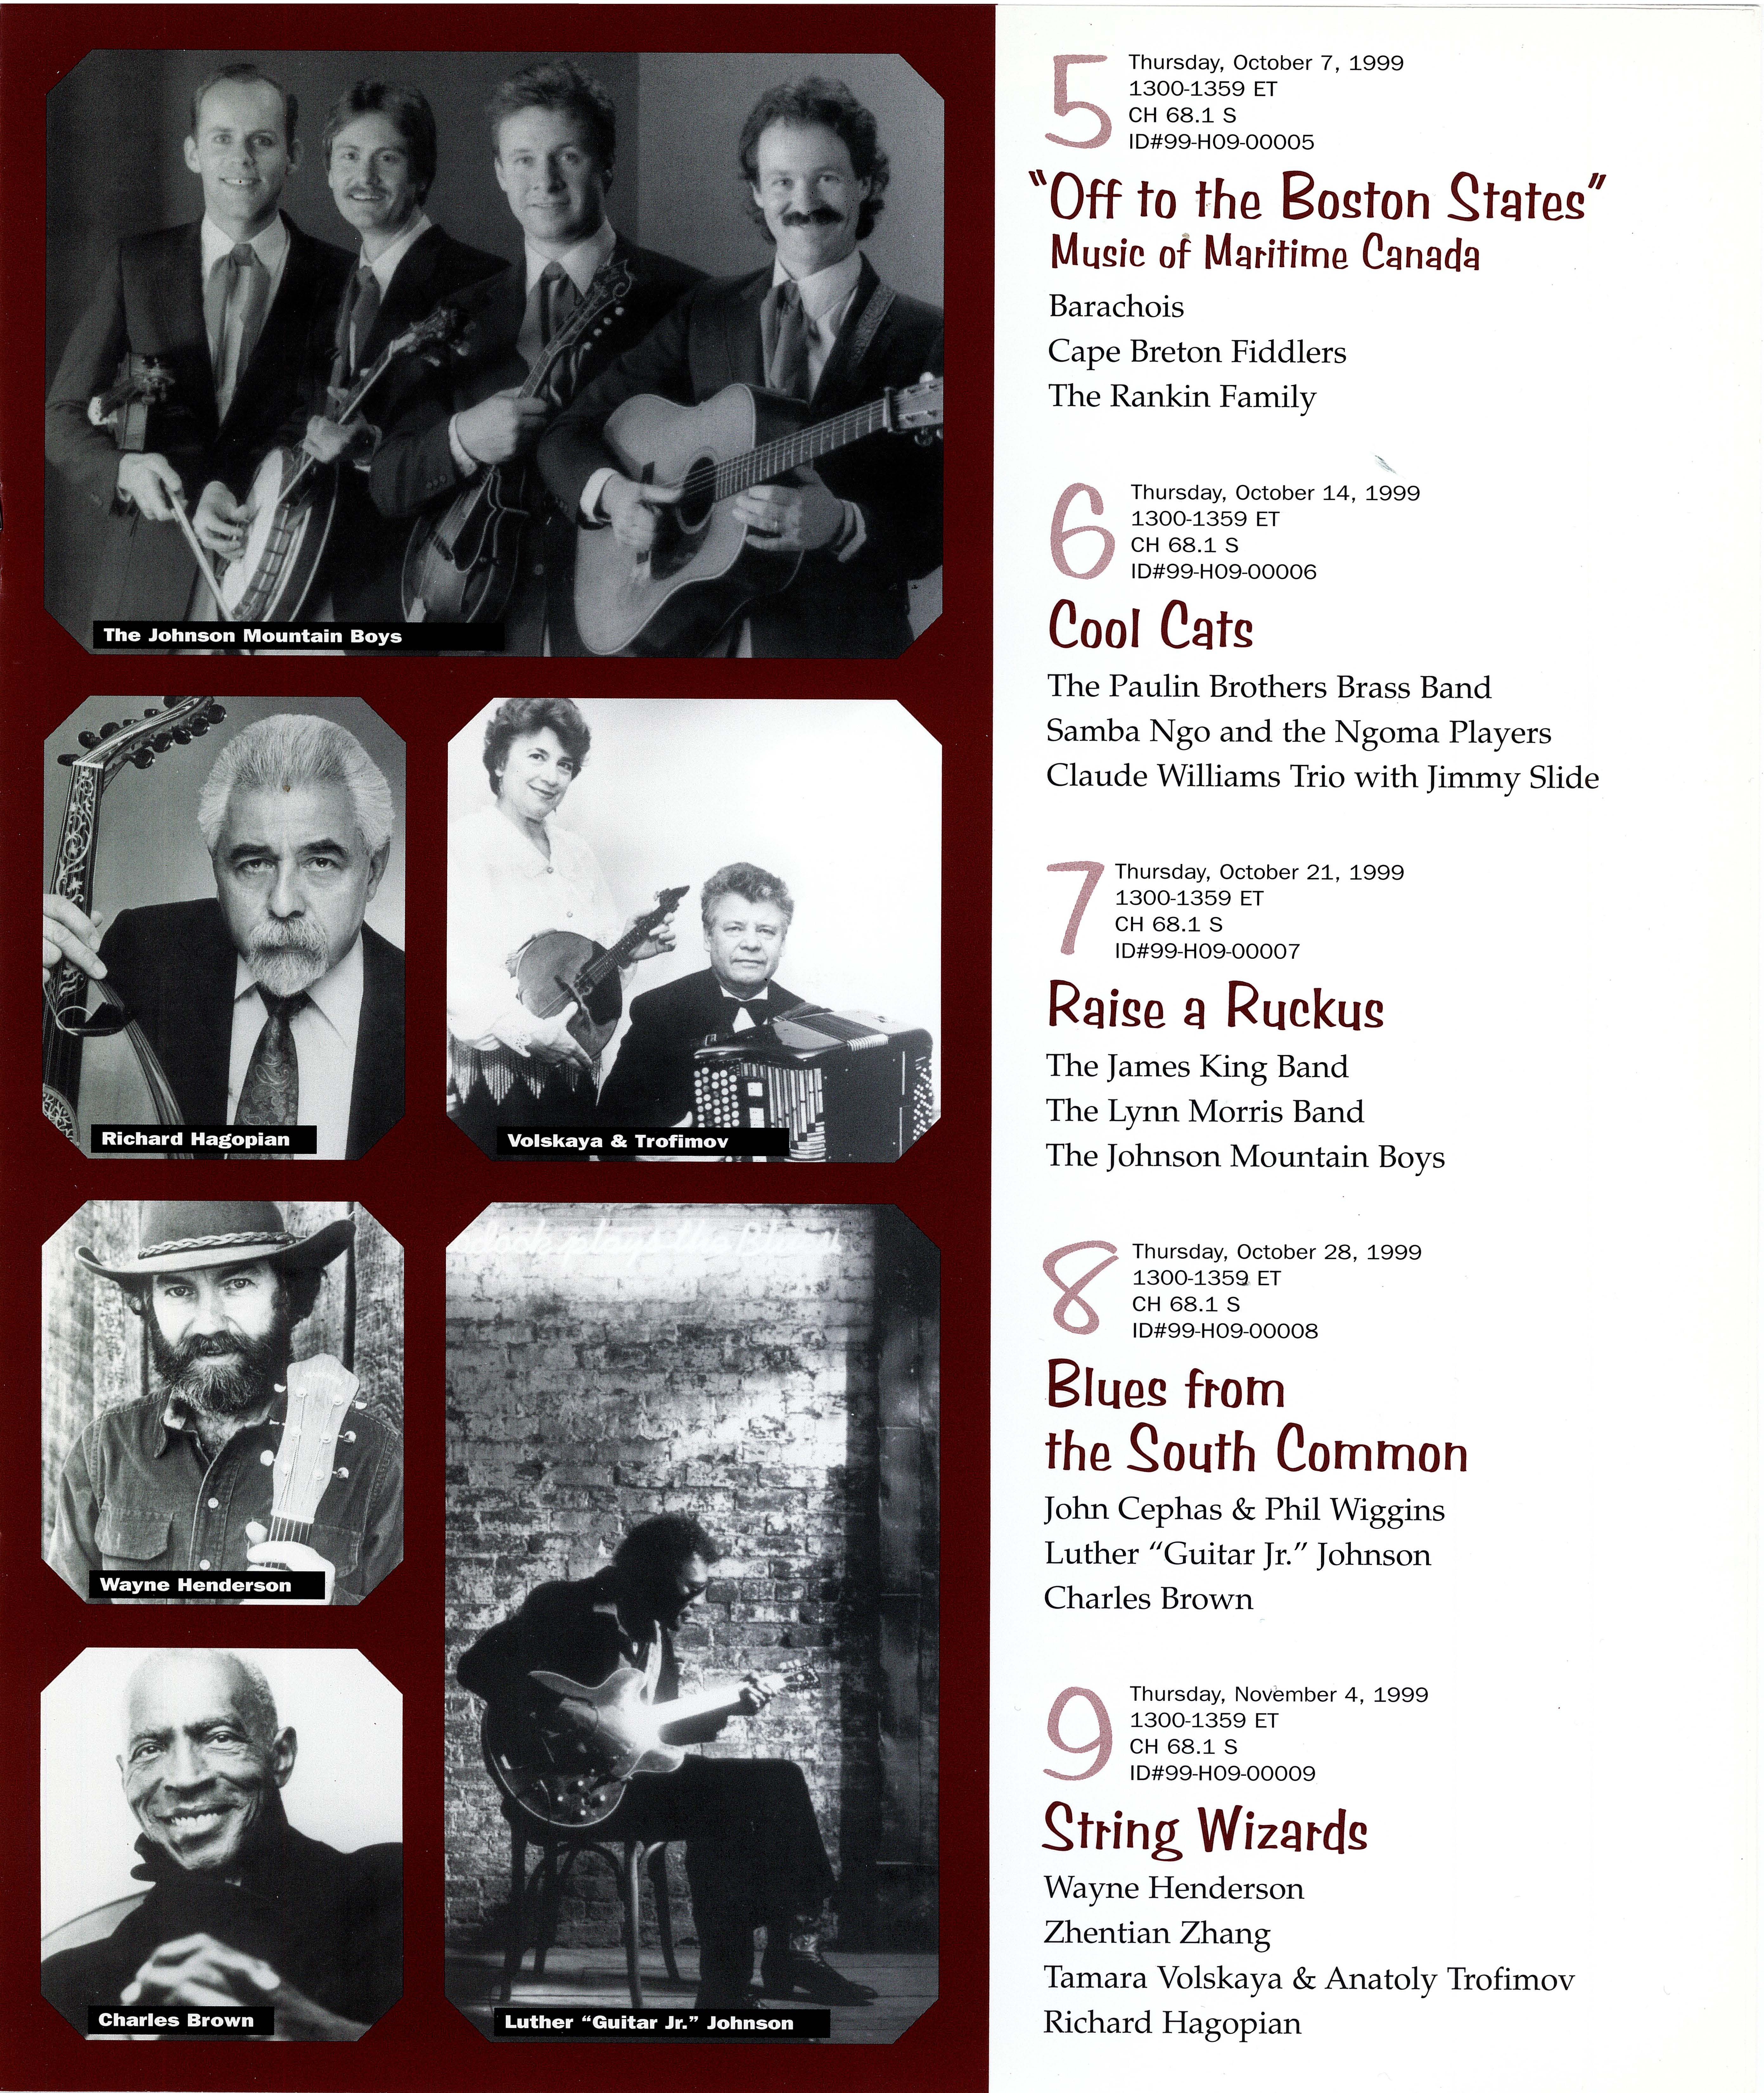 LFF_WDUQ-Radio-brochure_Page_5